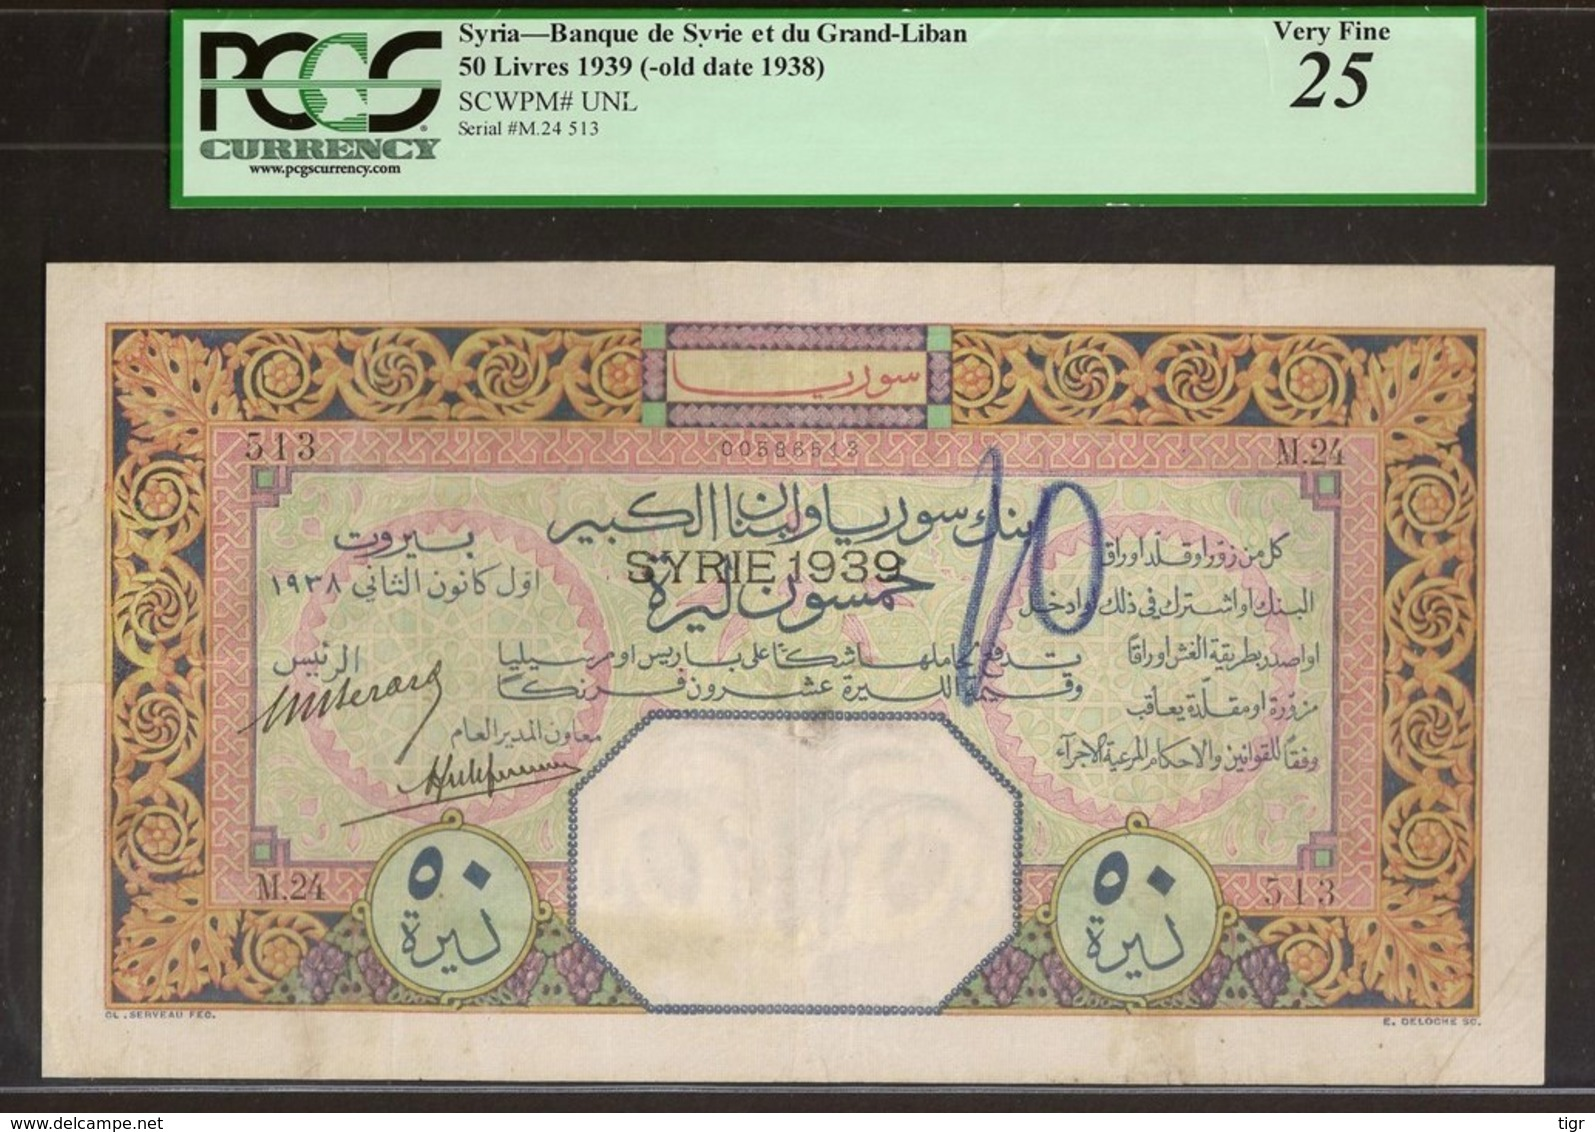 SYRIA. 50 Livres 1939. Banque De Syrie Et Du Grand - Liban. Pick Unlisted. - Syrie